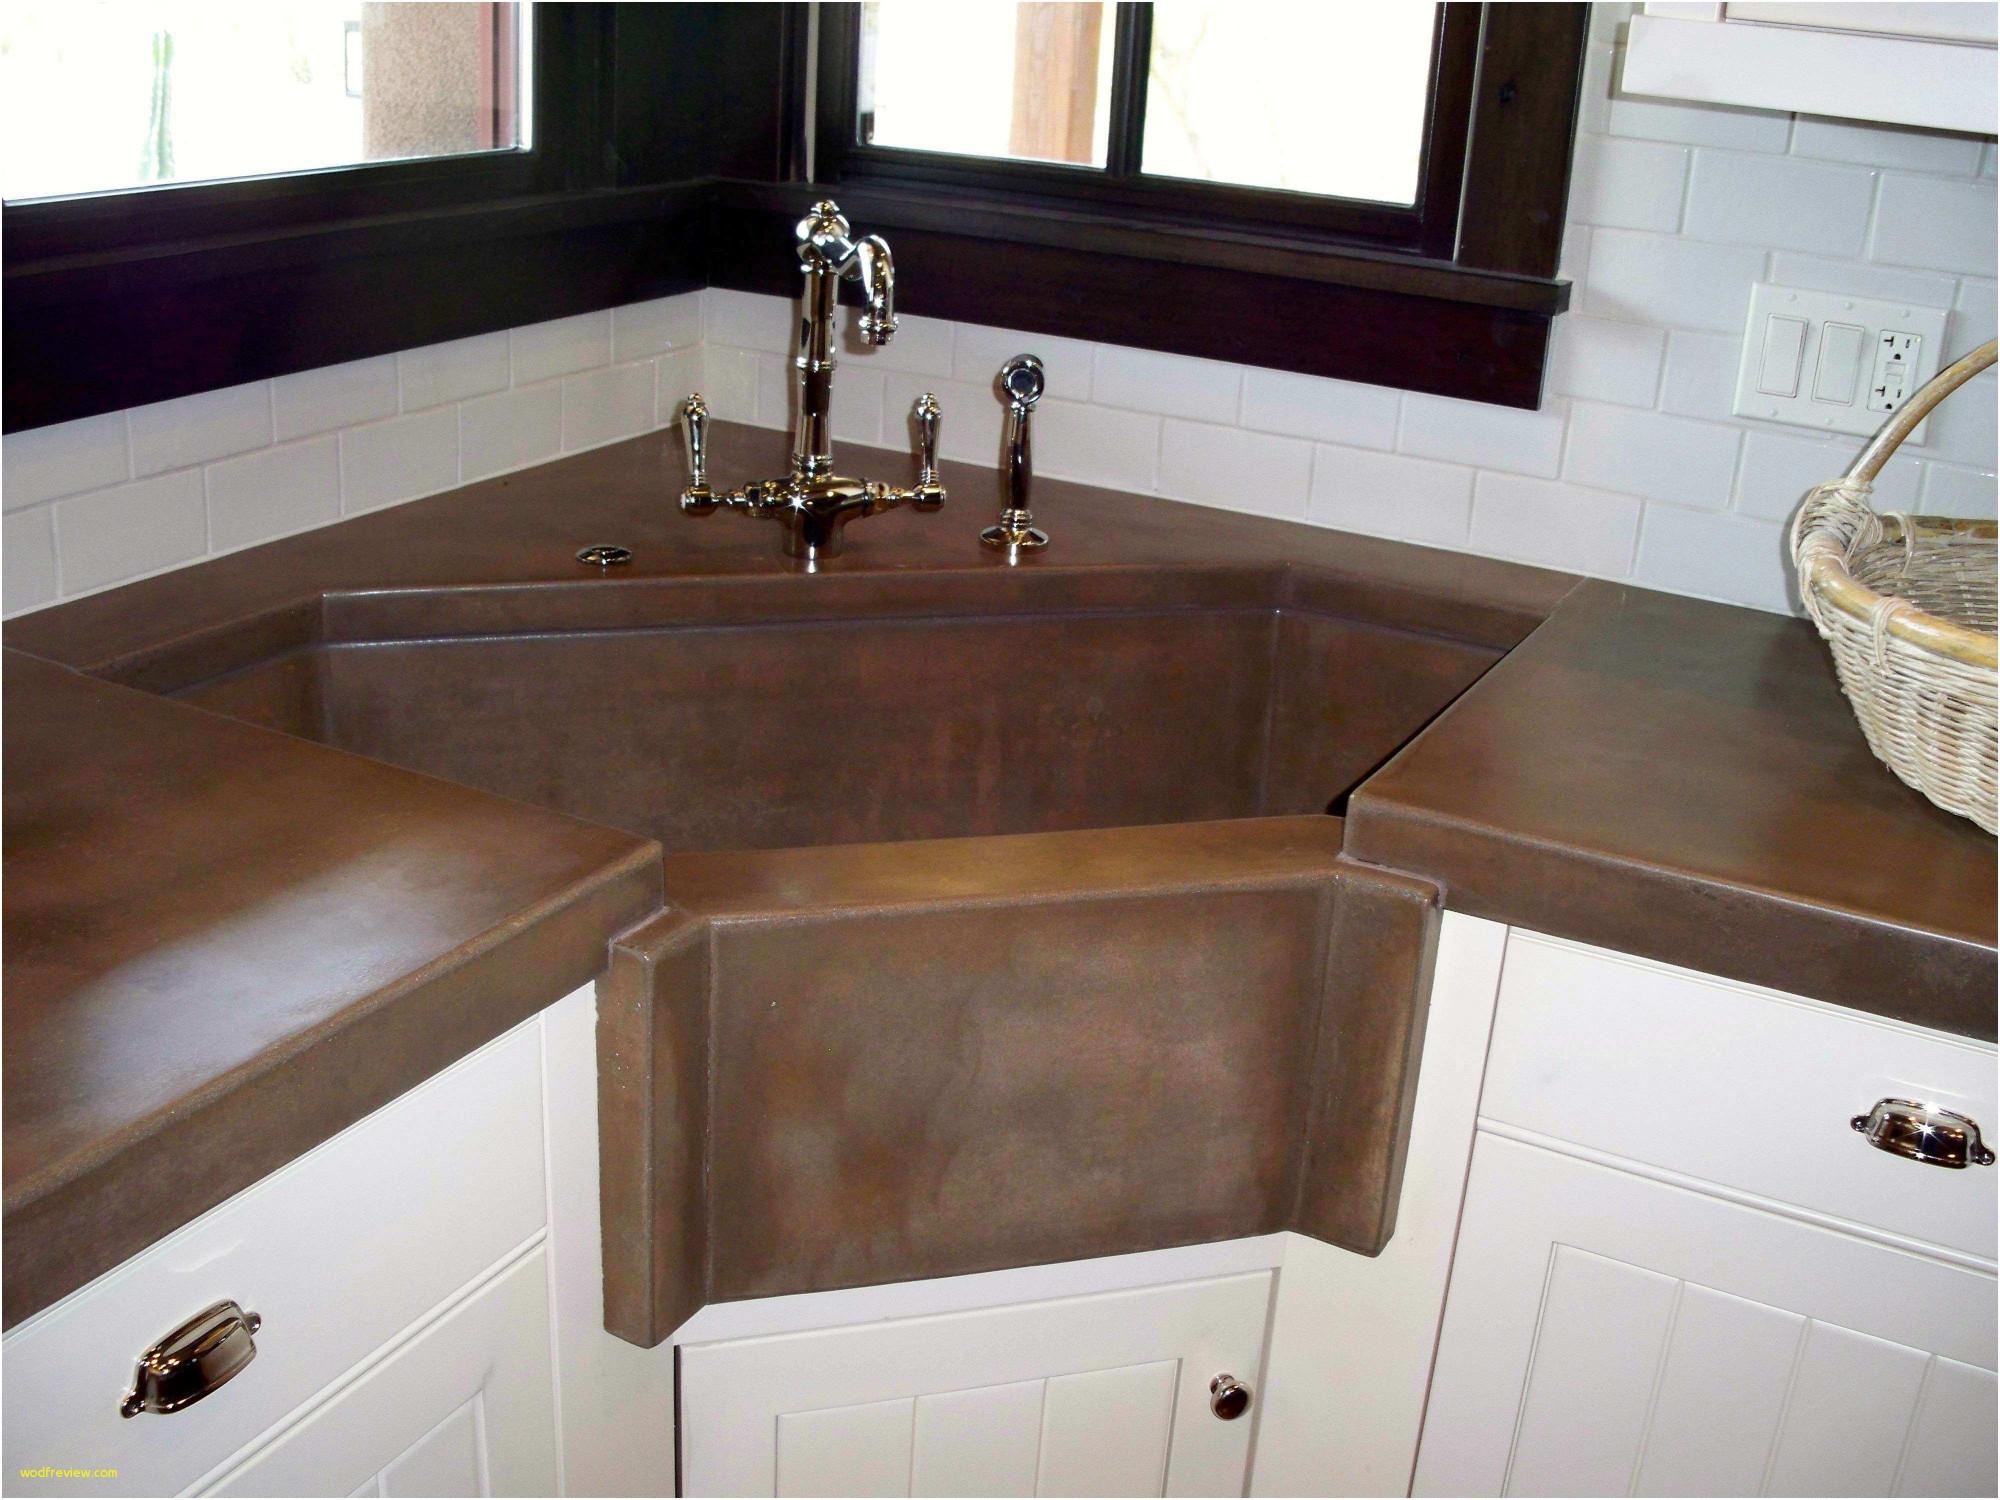 Kitchen Ideas Elegant Kitchen Design for Small House Unique Kitchen Ideas Bathroom Elegant